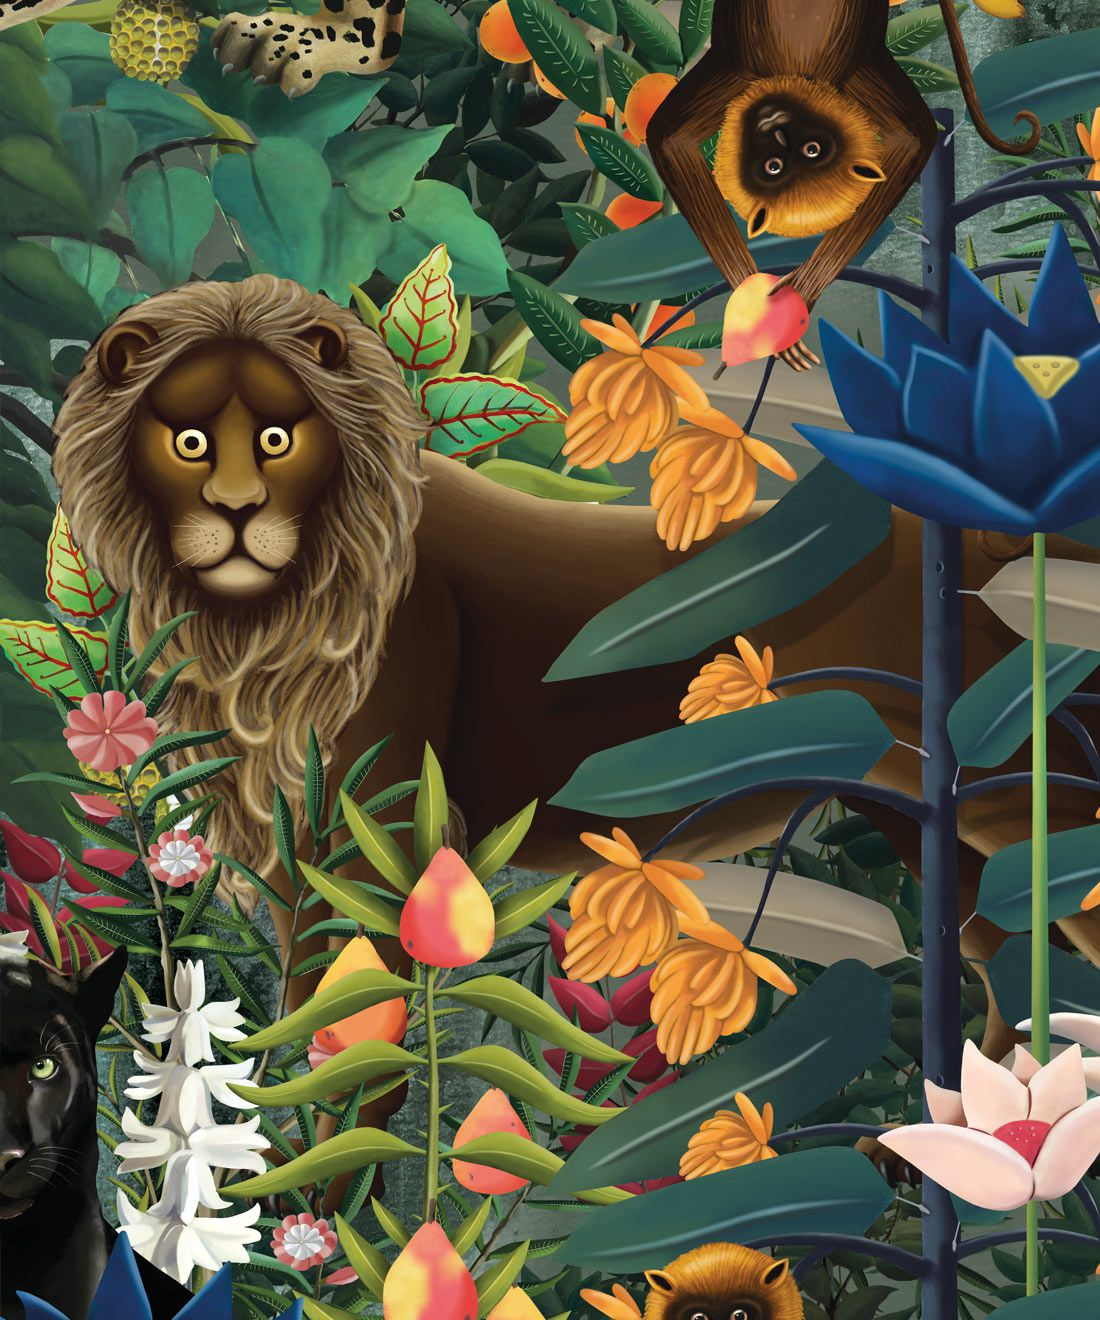 The Jungle Wallpaper • Animal Wallpaper • Botanical Wallpaper • Night Wallpaper • Swatch